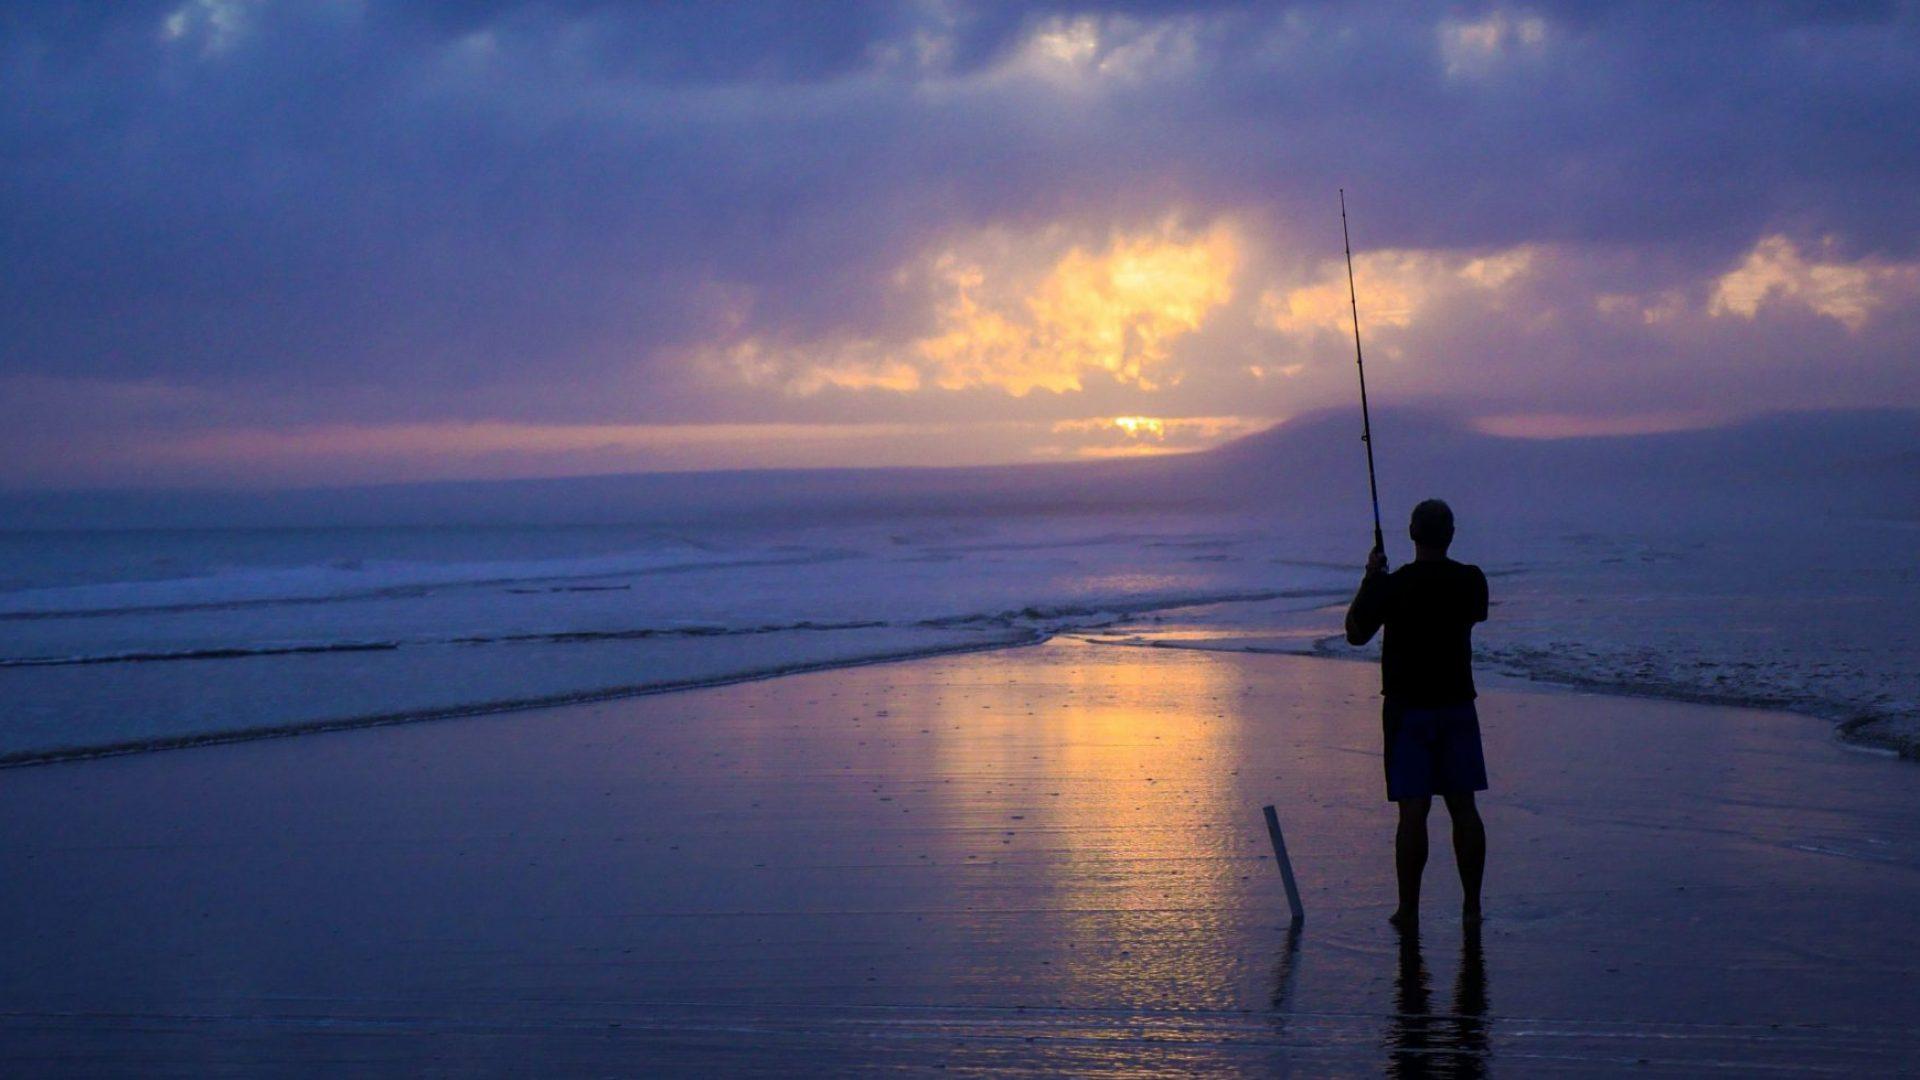 Angler am Strand - Gott kennen